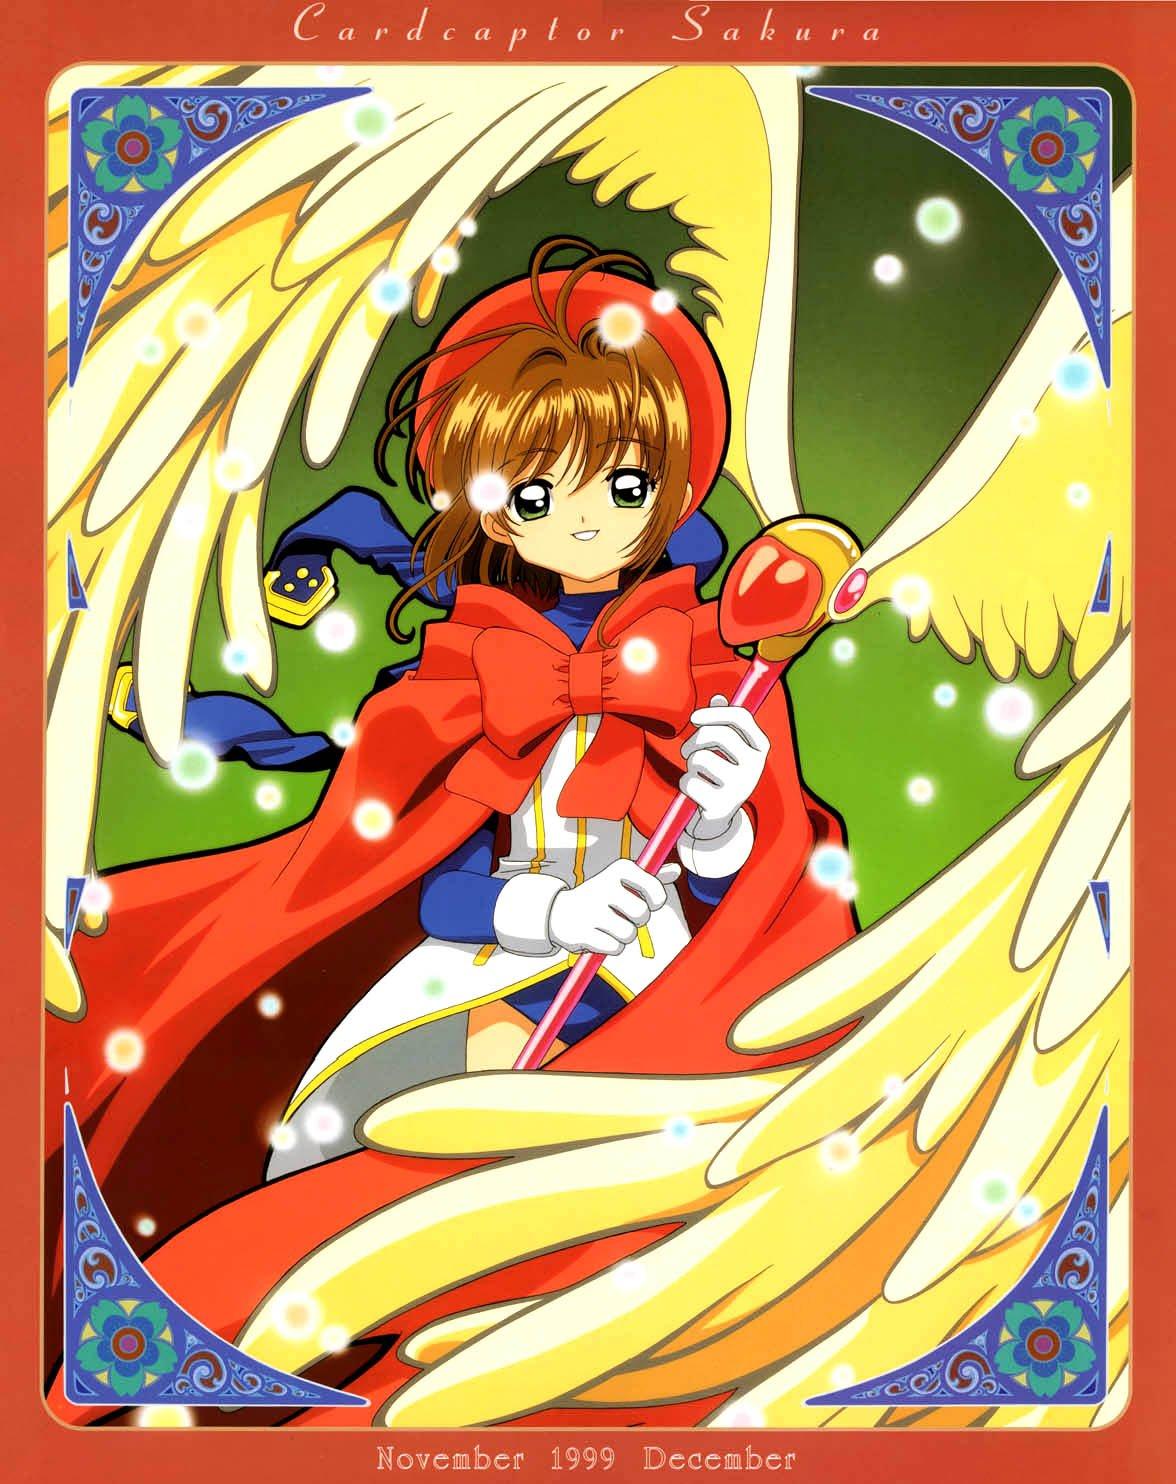 Card Wallpaper Hd Card Captor Sakura Grafica